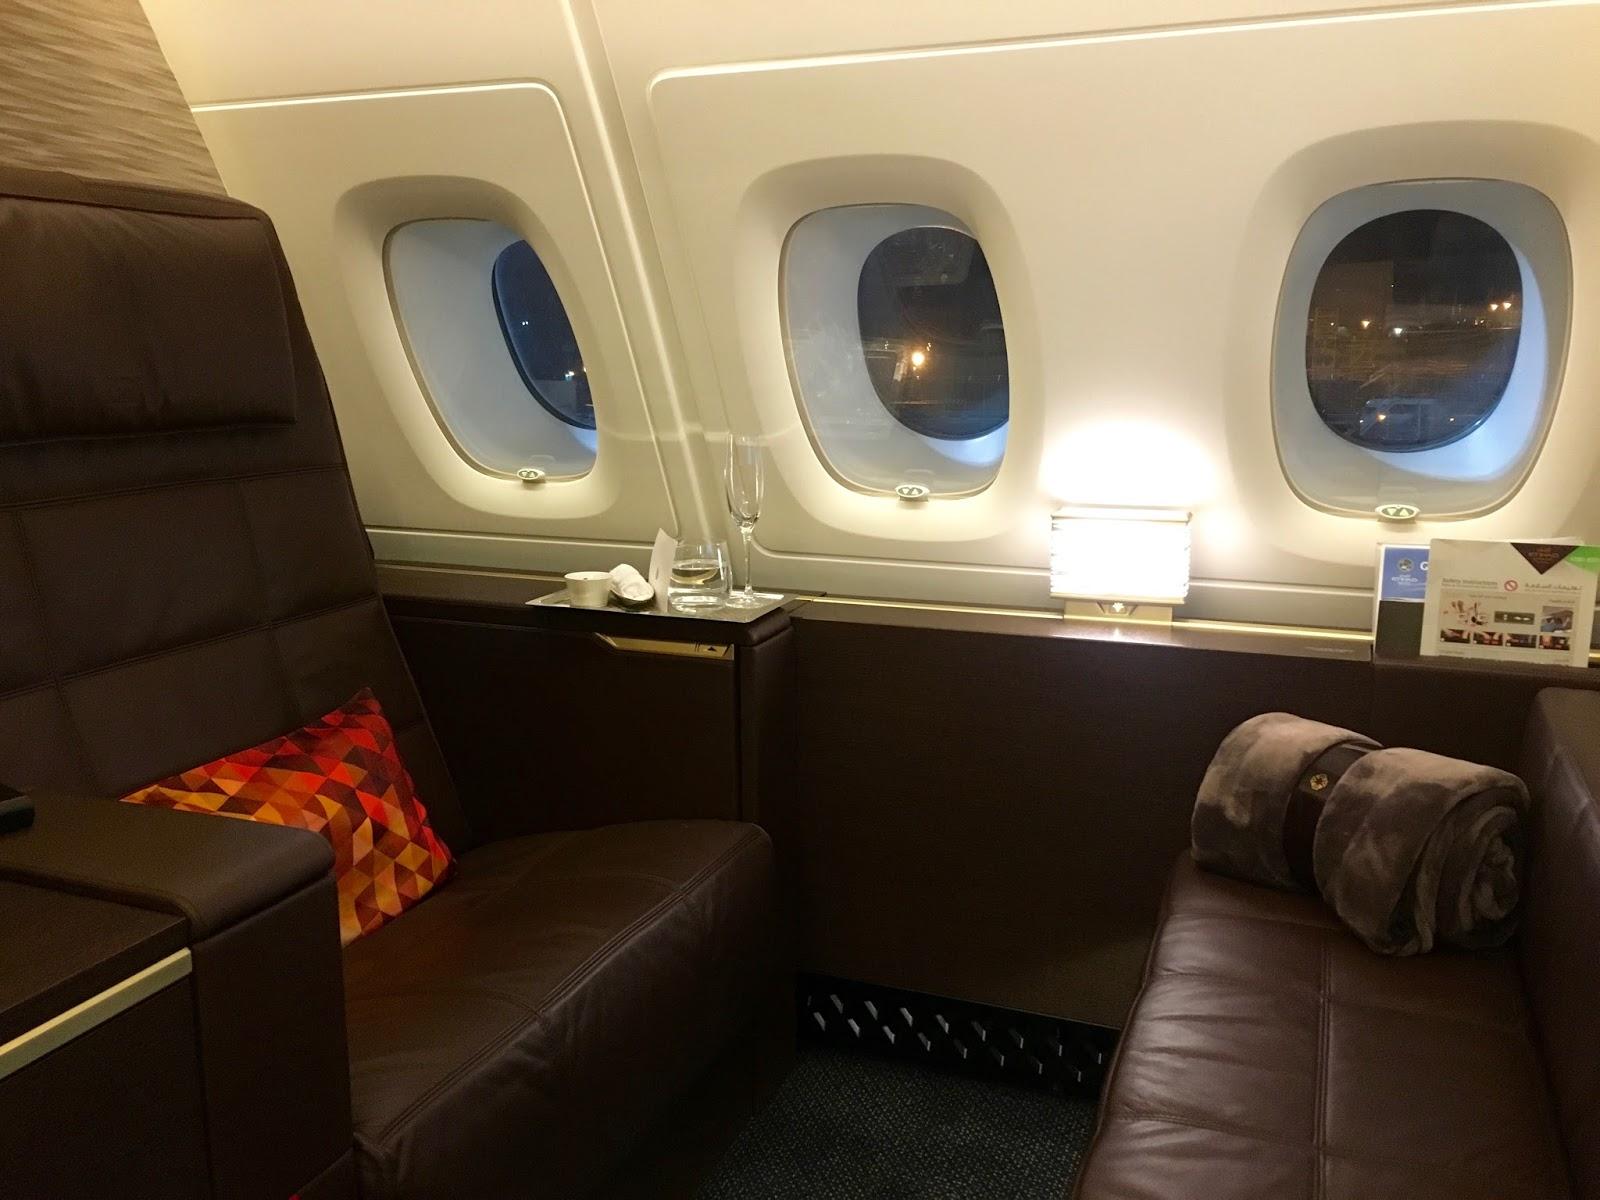 Pic etihad airways a380 first class apartment 4k may 2015 - Etihad A380 First Class Apartment 3k